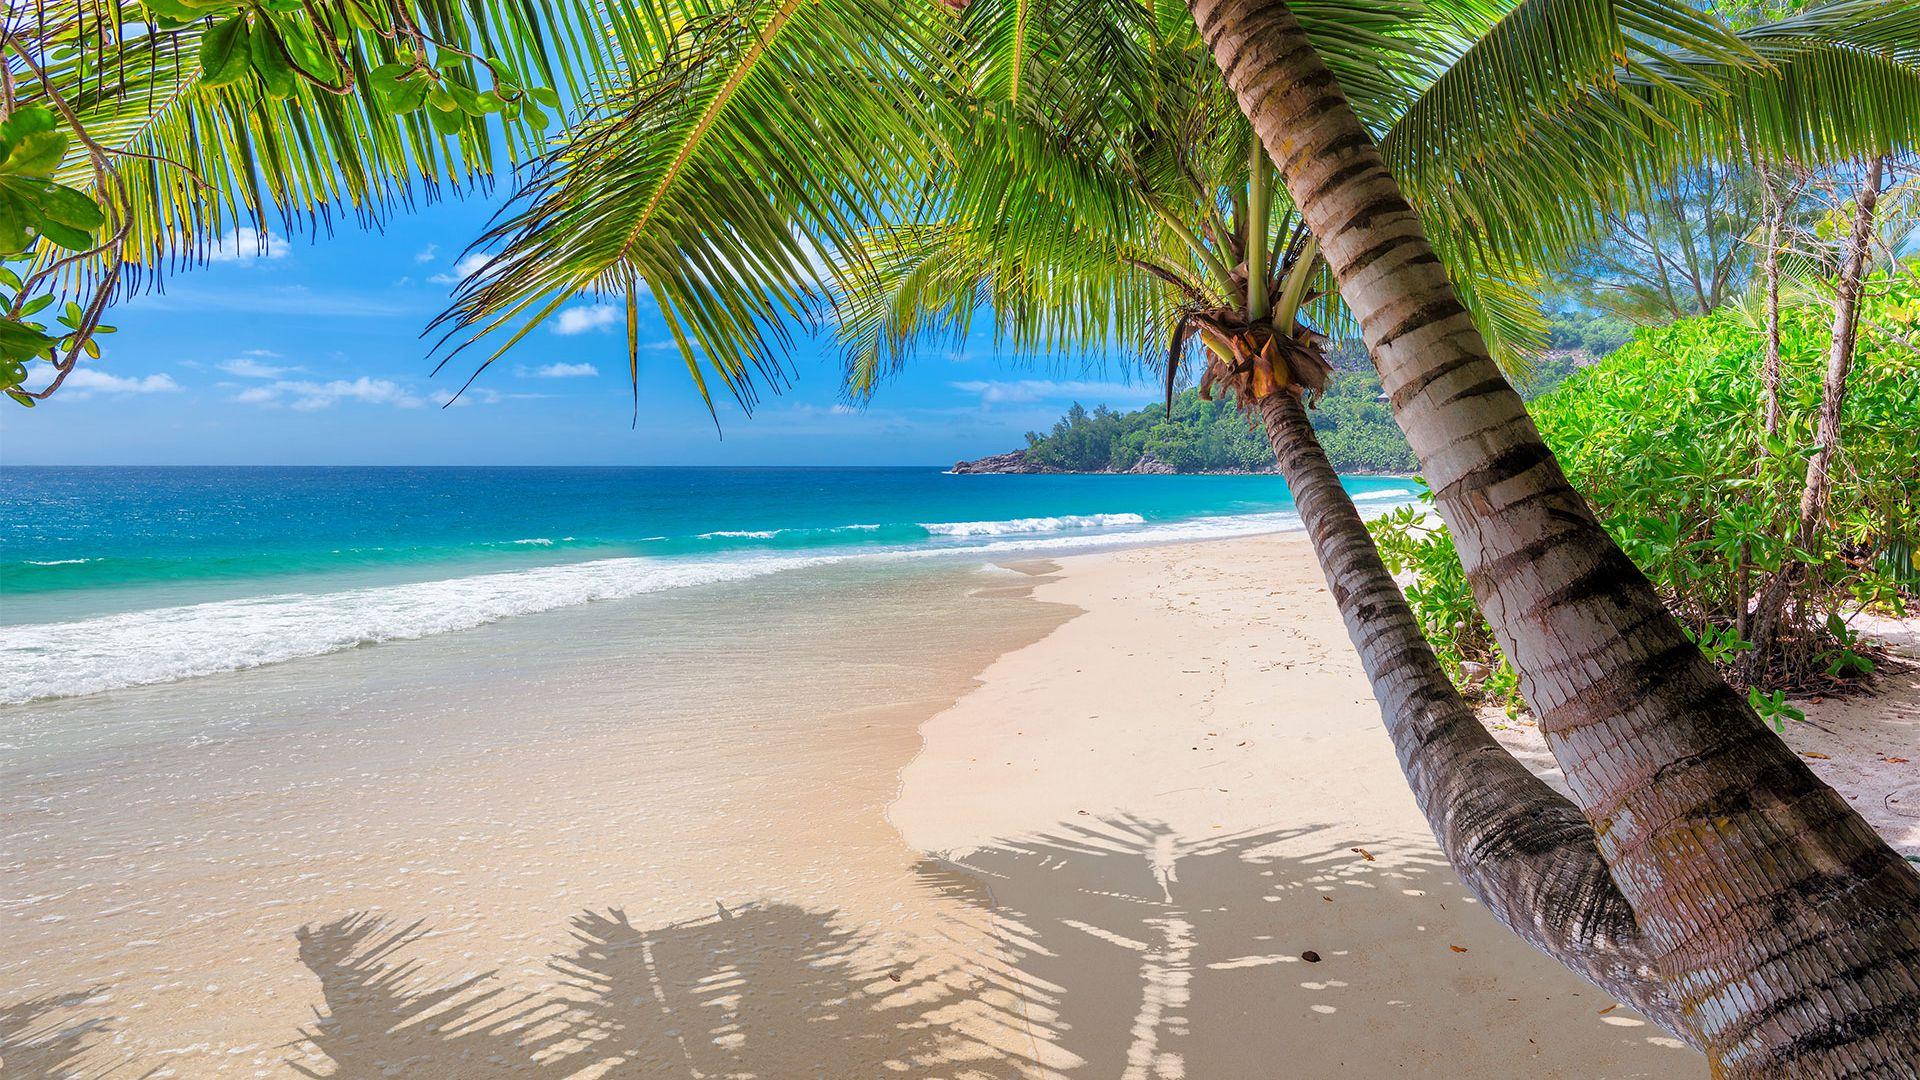 Sejur plaja Montego Bay, 9 zile - ianuarie 2022